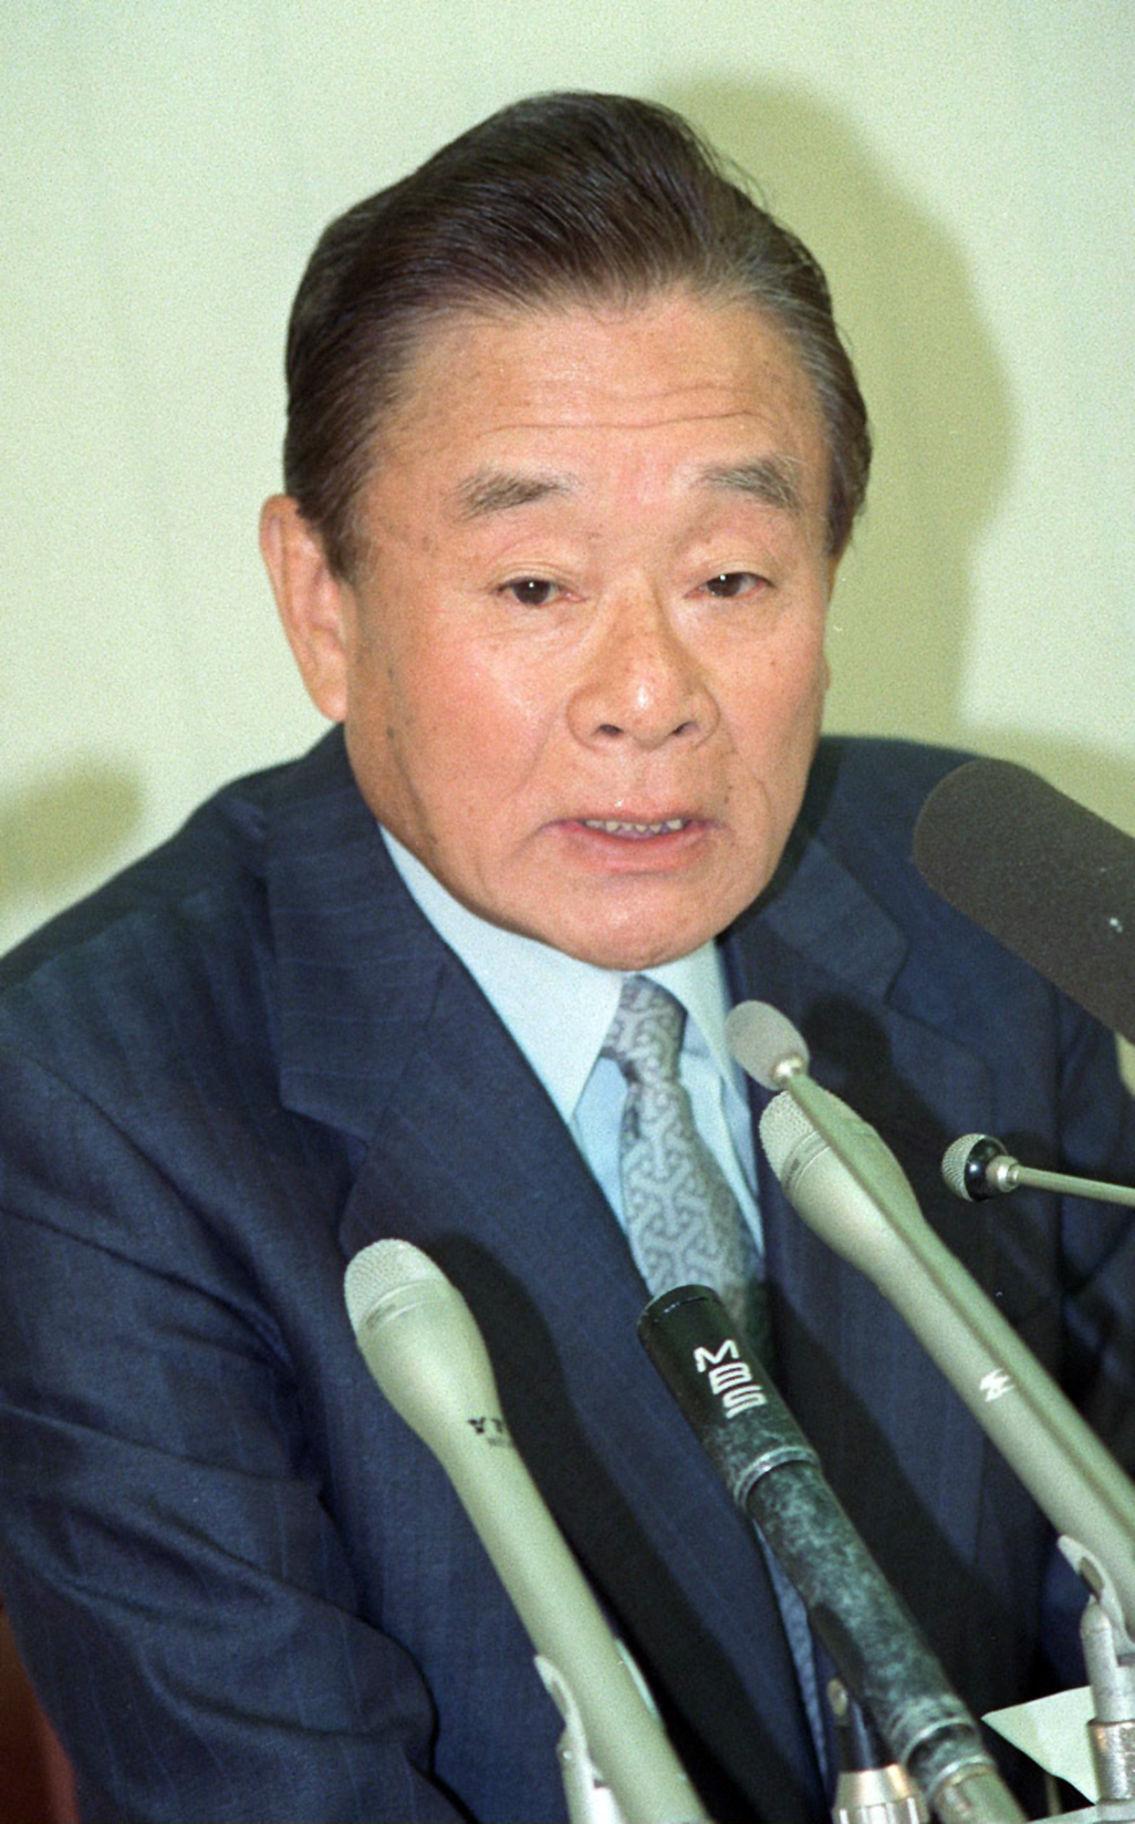 Former Panasonic president Matsushita dies at 99